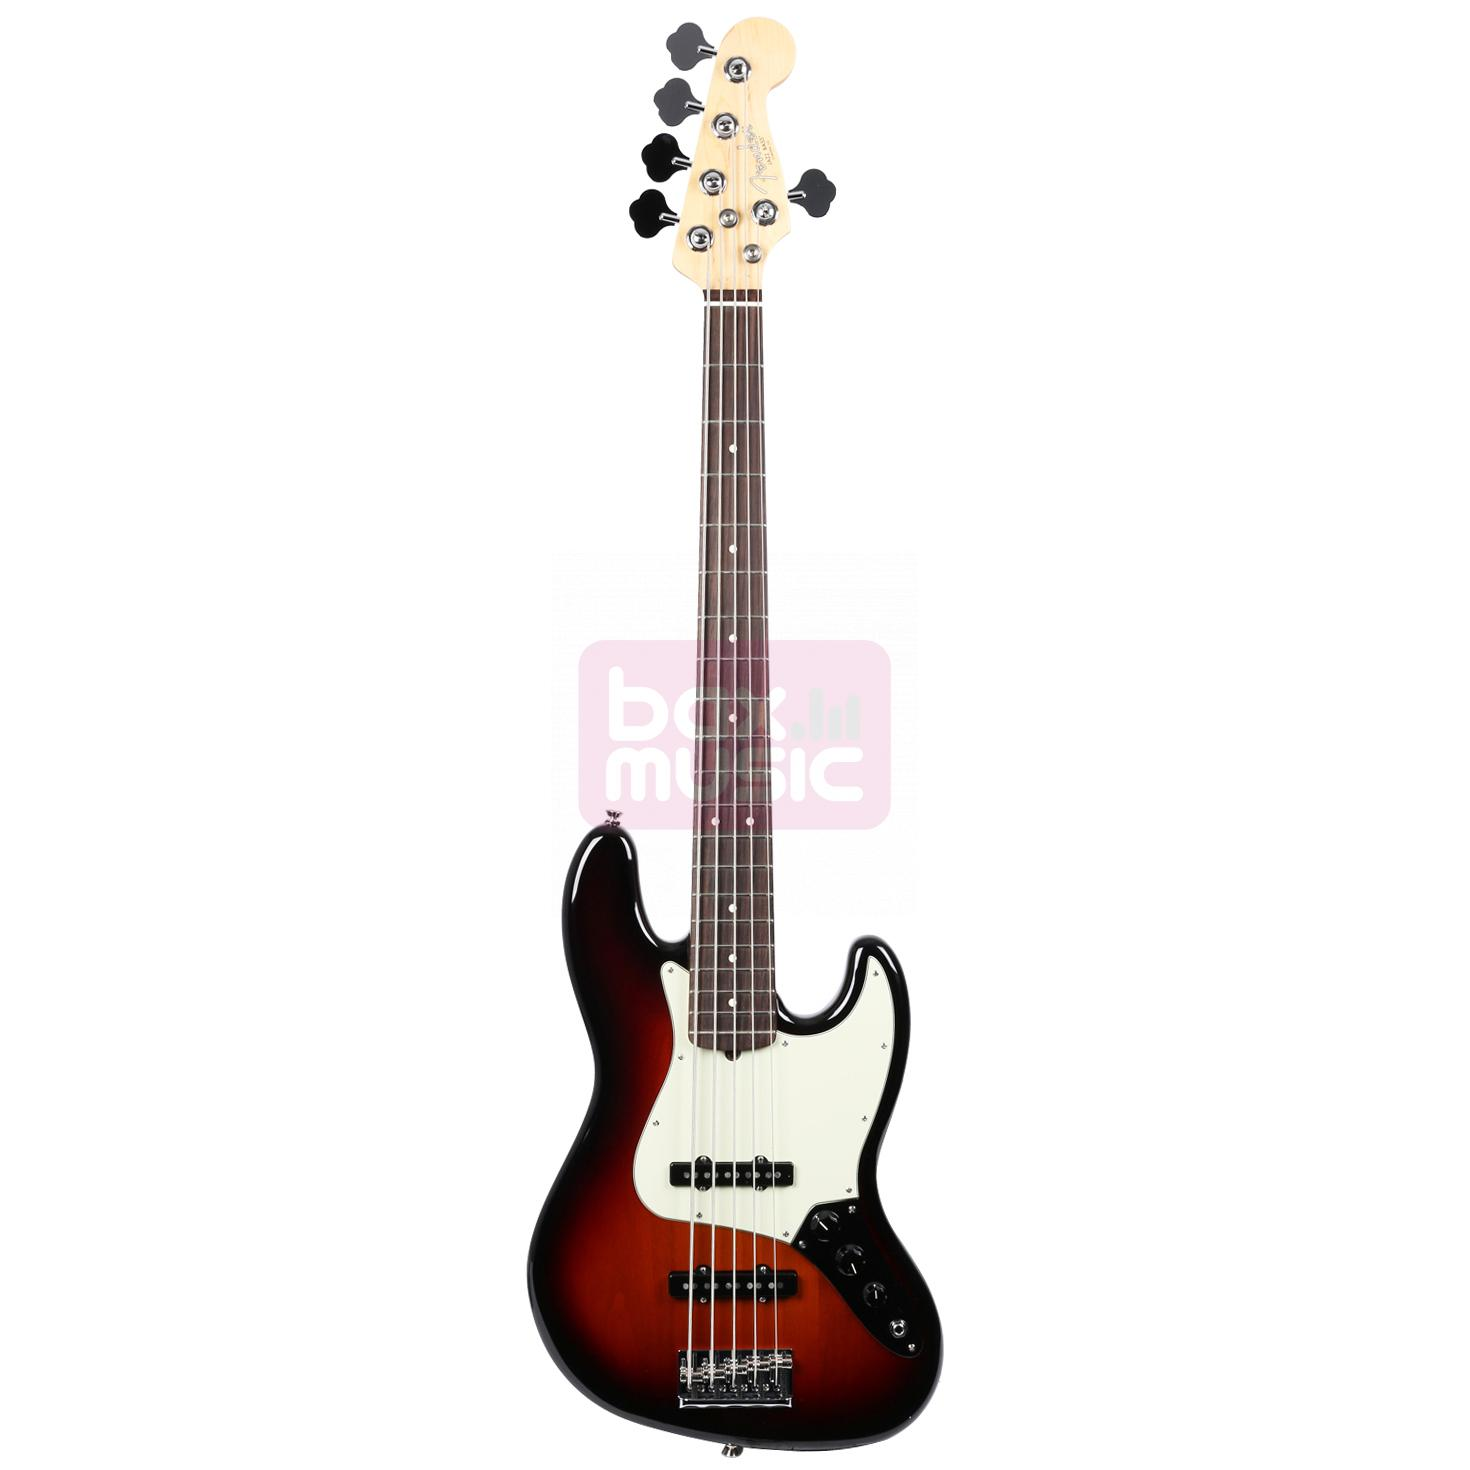 Fender American Professional Jazz Bass V 3-Color Sunburst RW